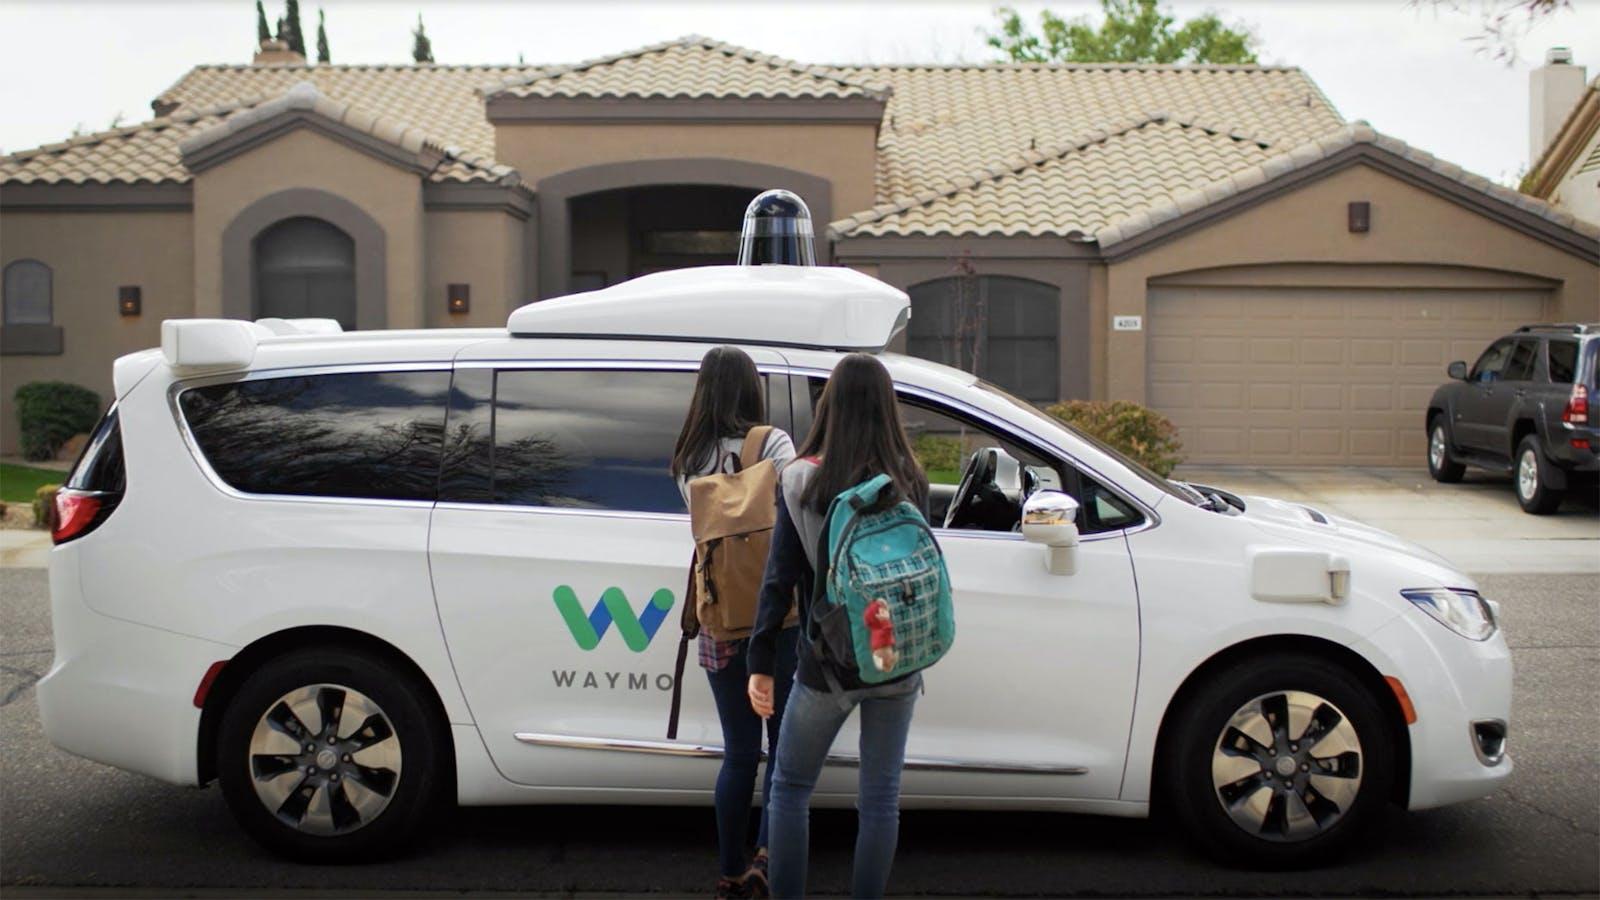 A Waymo self-driving vehicle. Still photo from a Waymo video